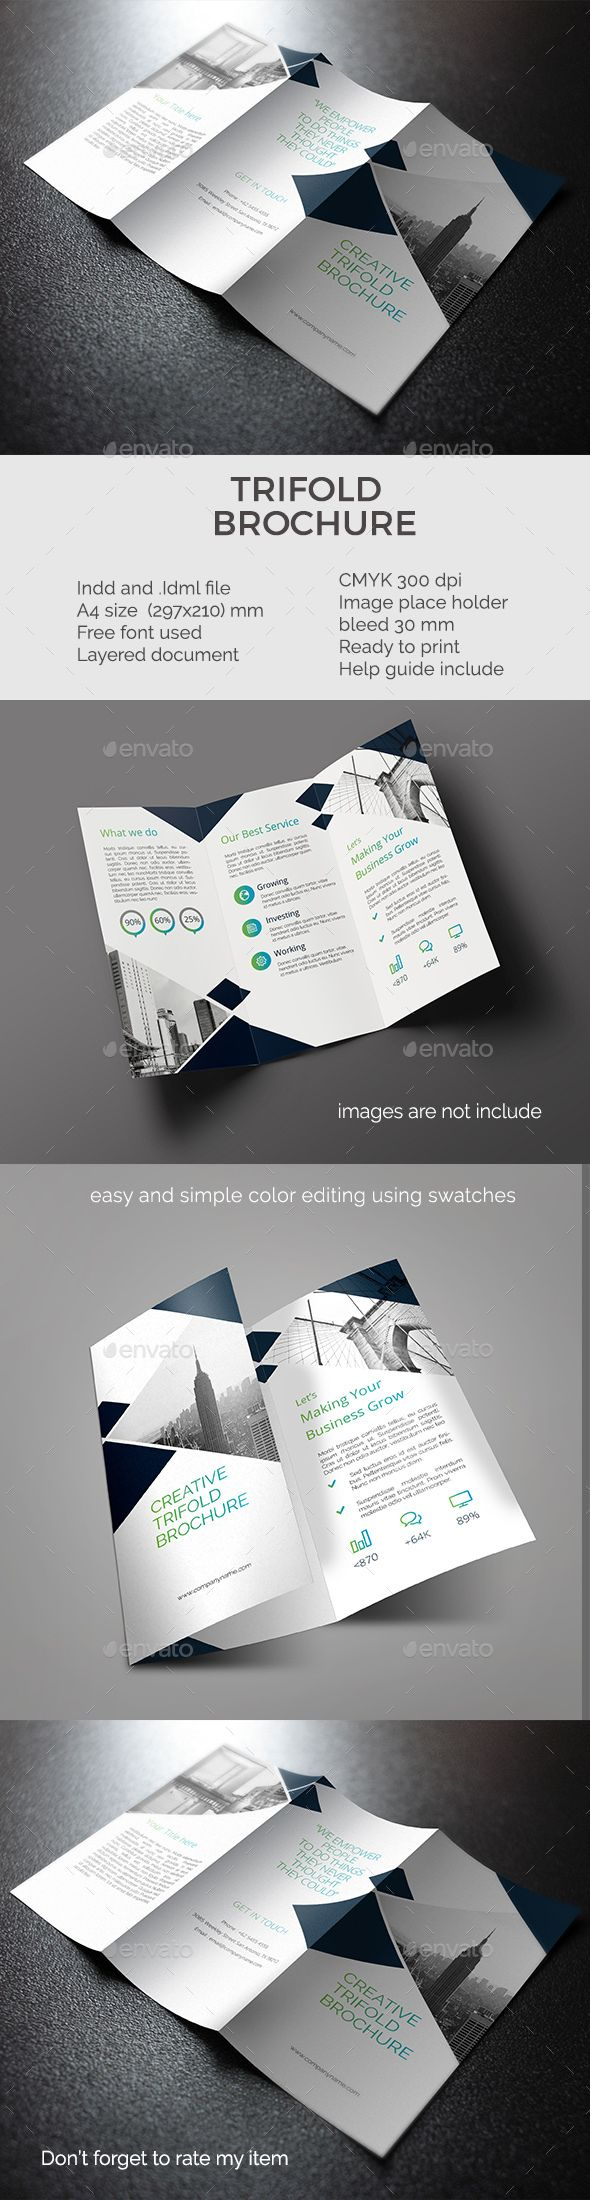 Best Brochure Images On Pinterest Brochure Template Flyer - Easy brochure template